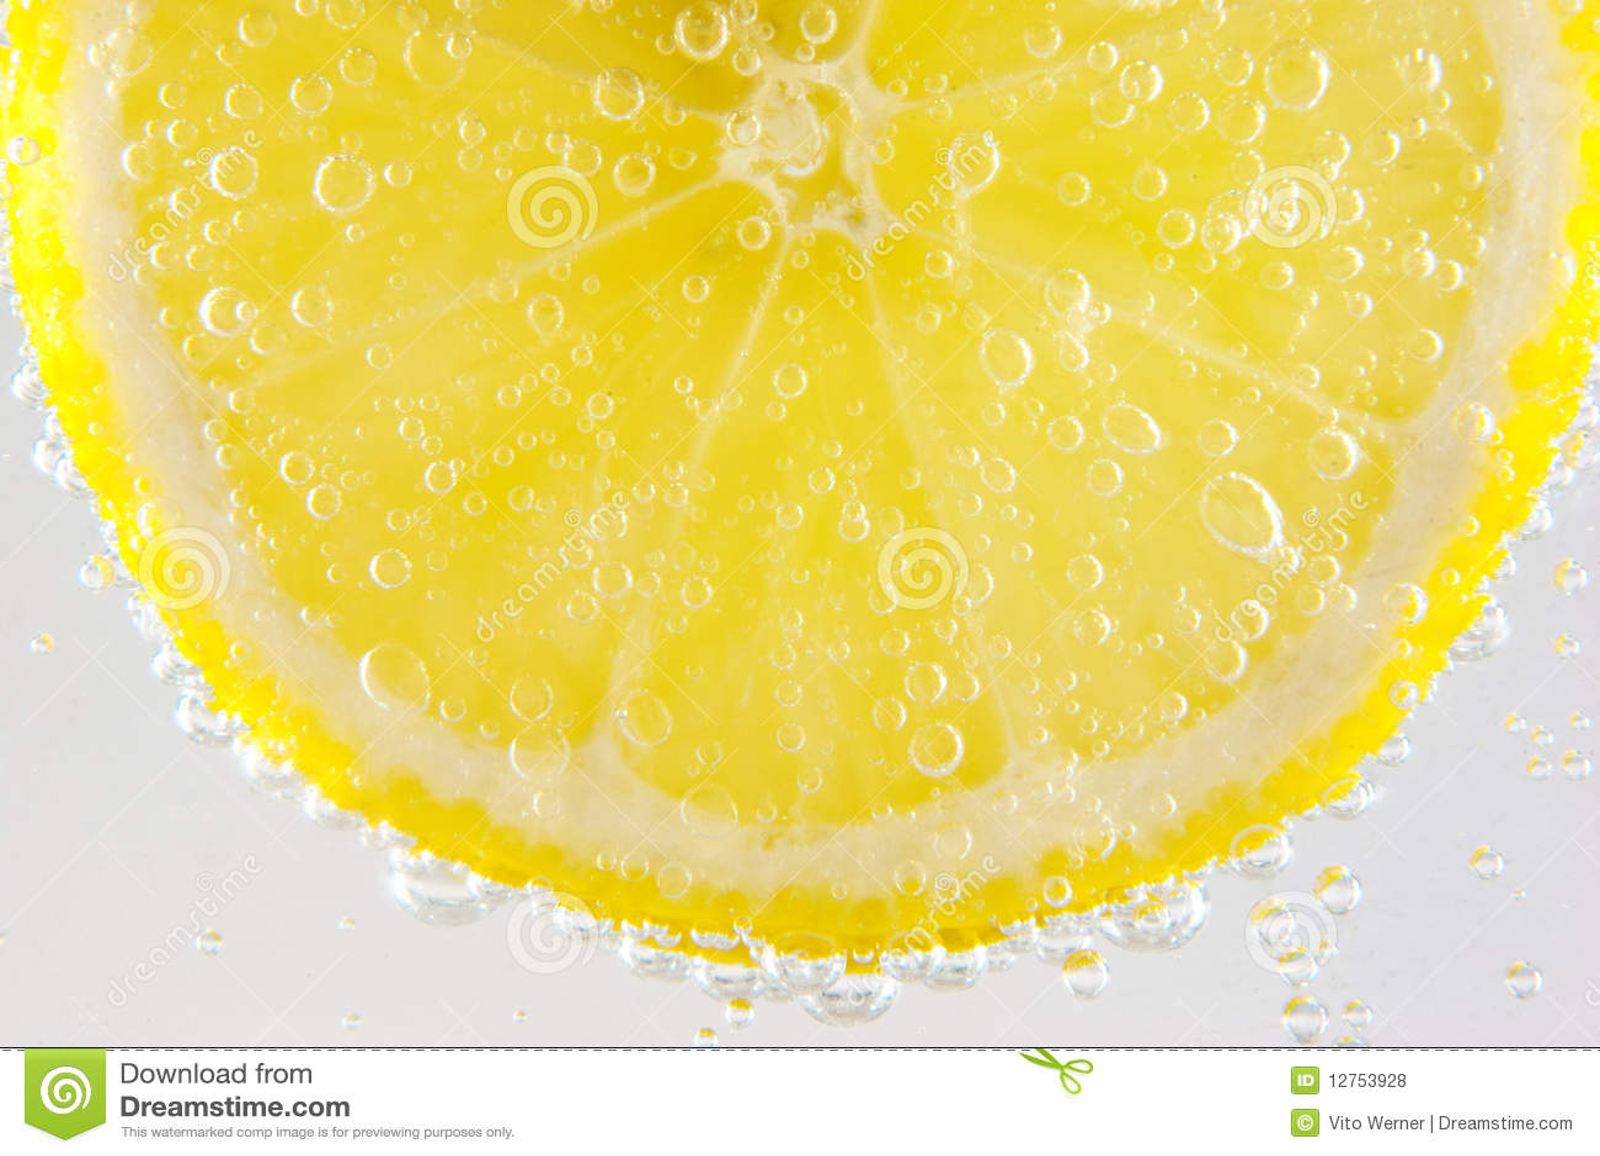 Limón en agua chispeante